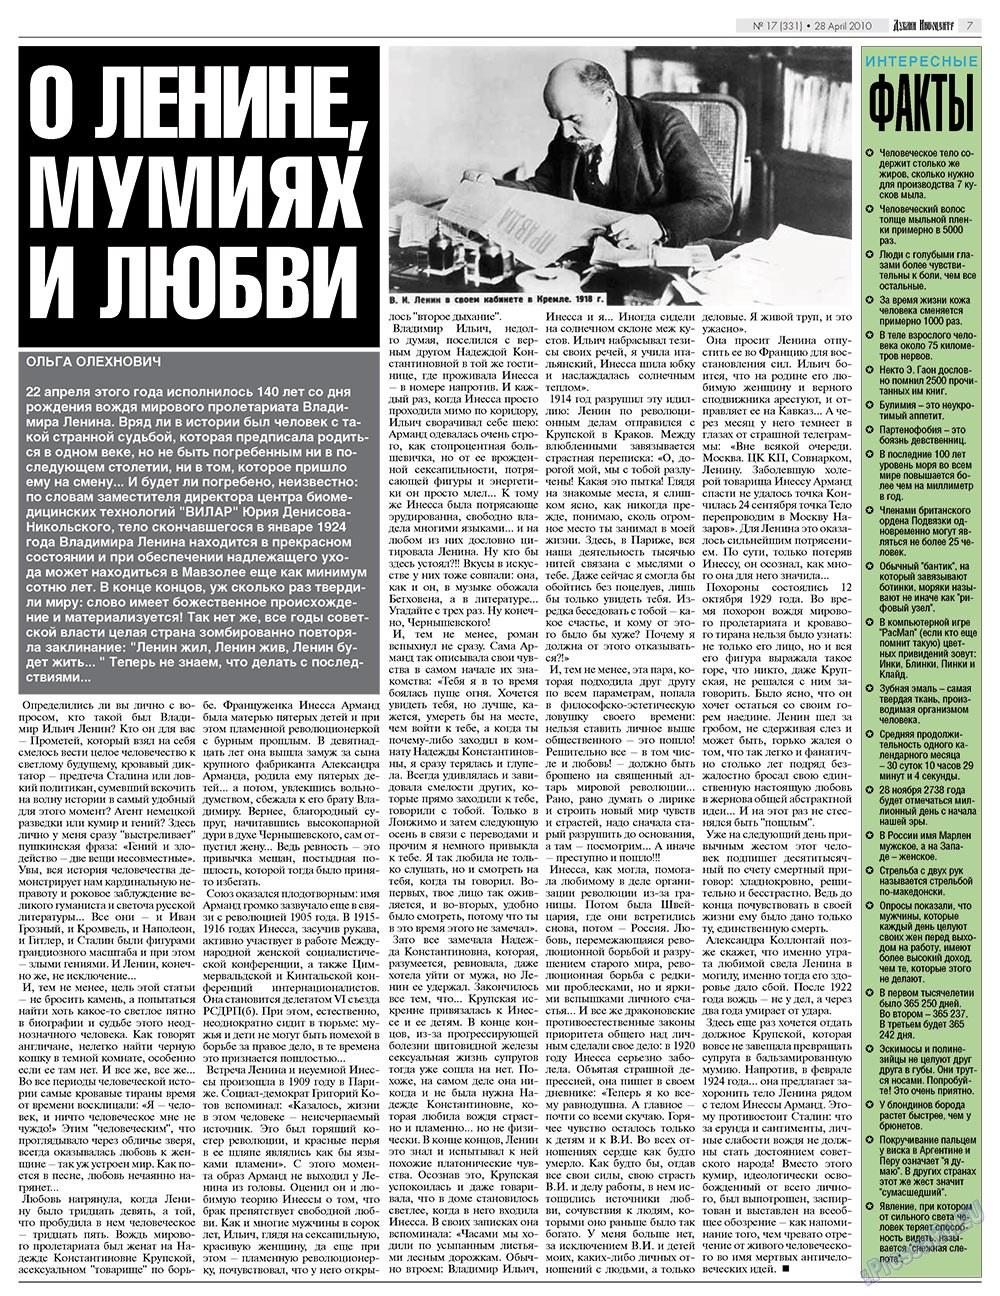 Дублин инфоцентр (газета). 2010 год, номер 17, стр. 7